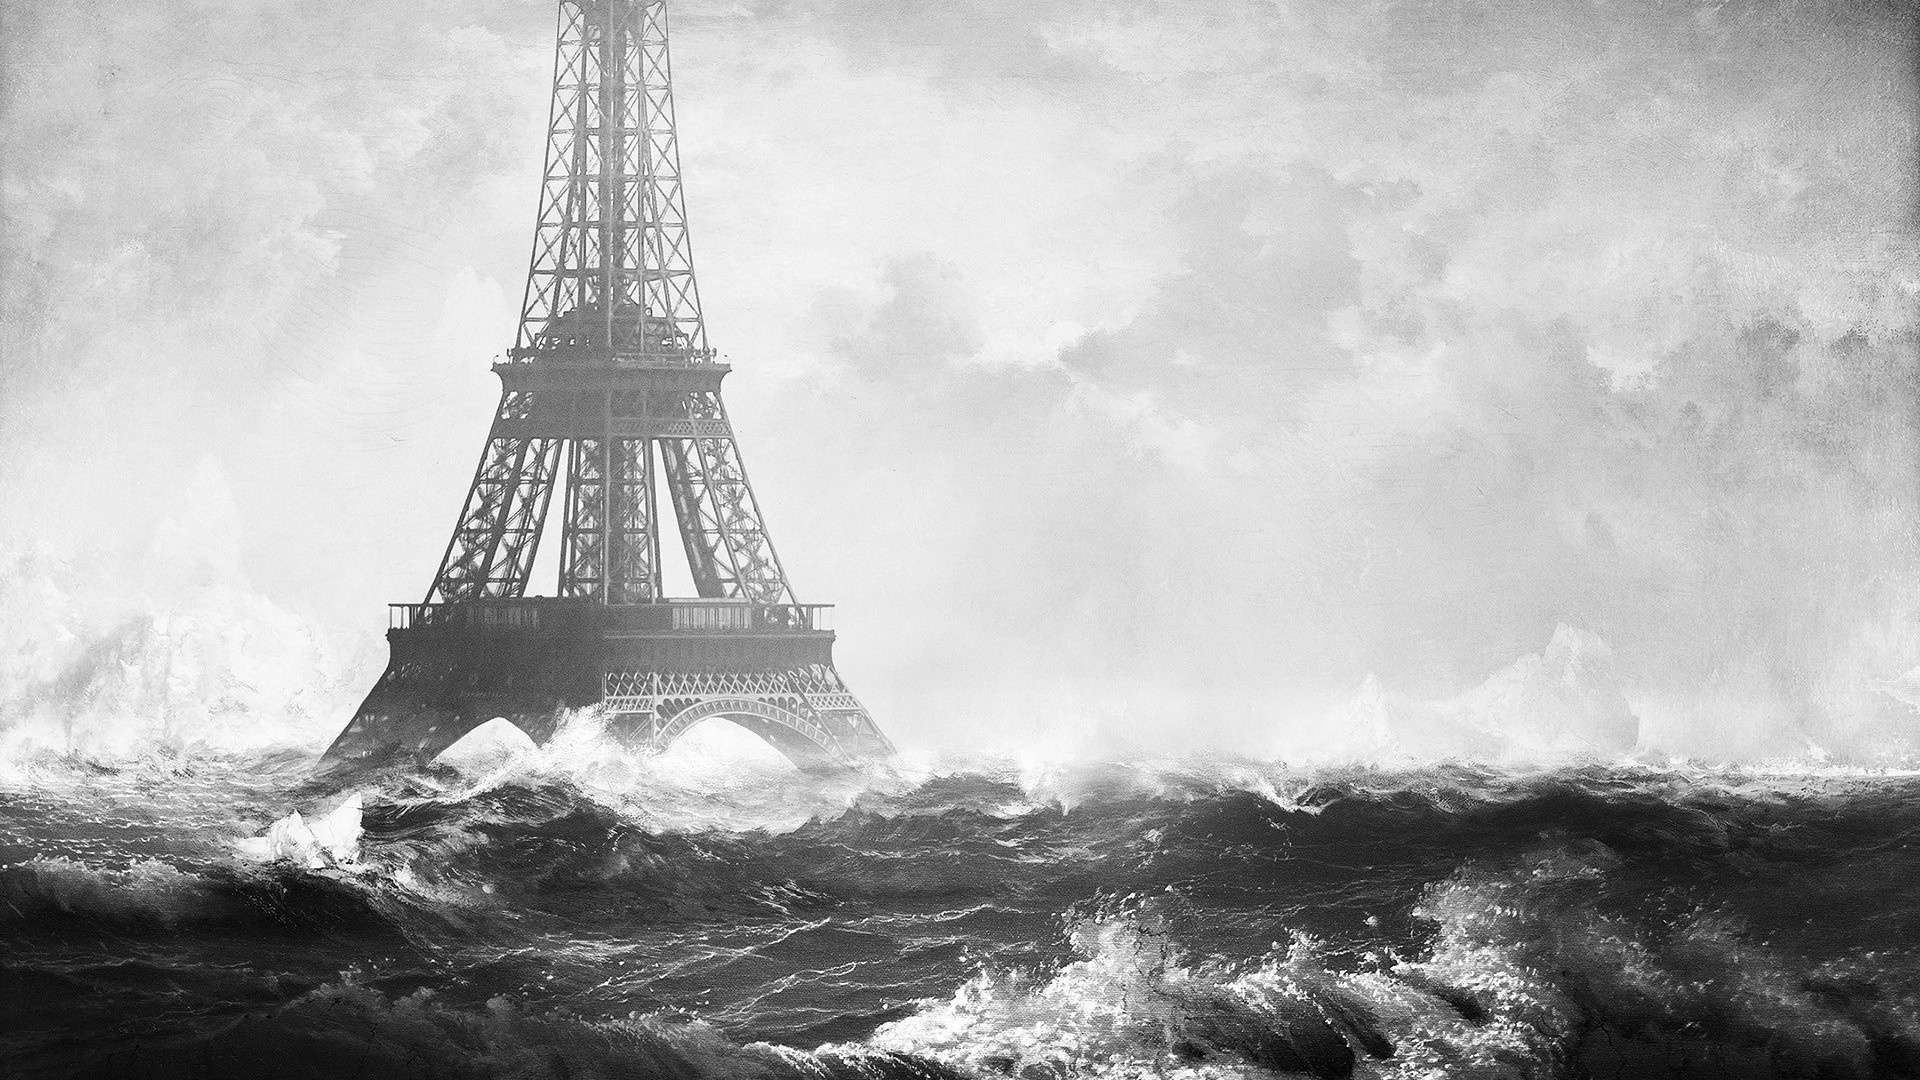 Eiffel Tower Art Image